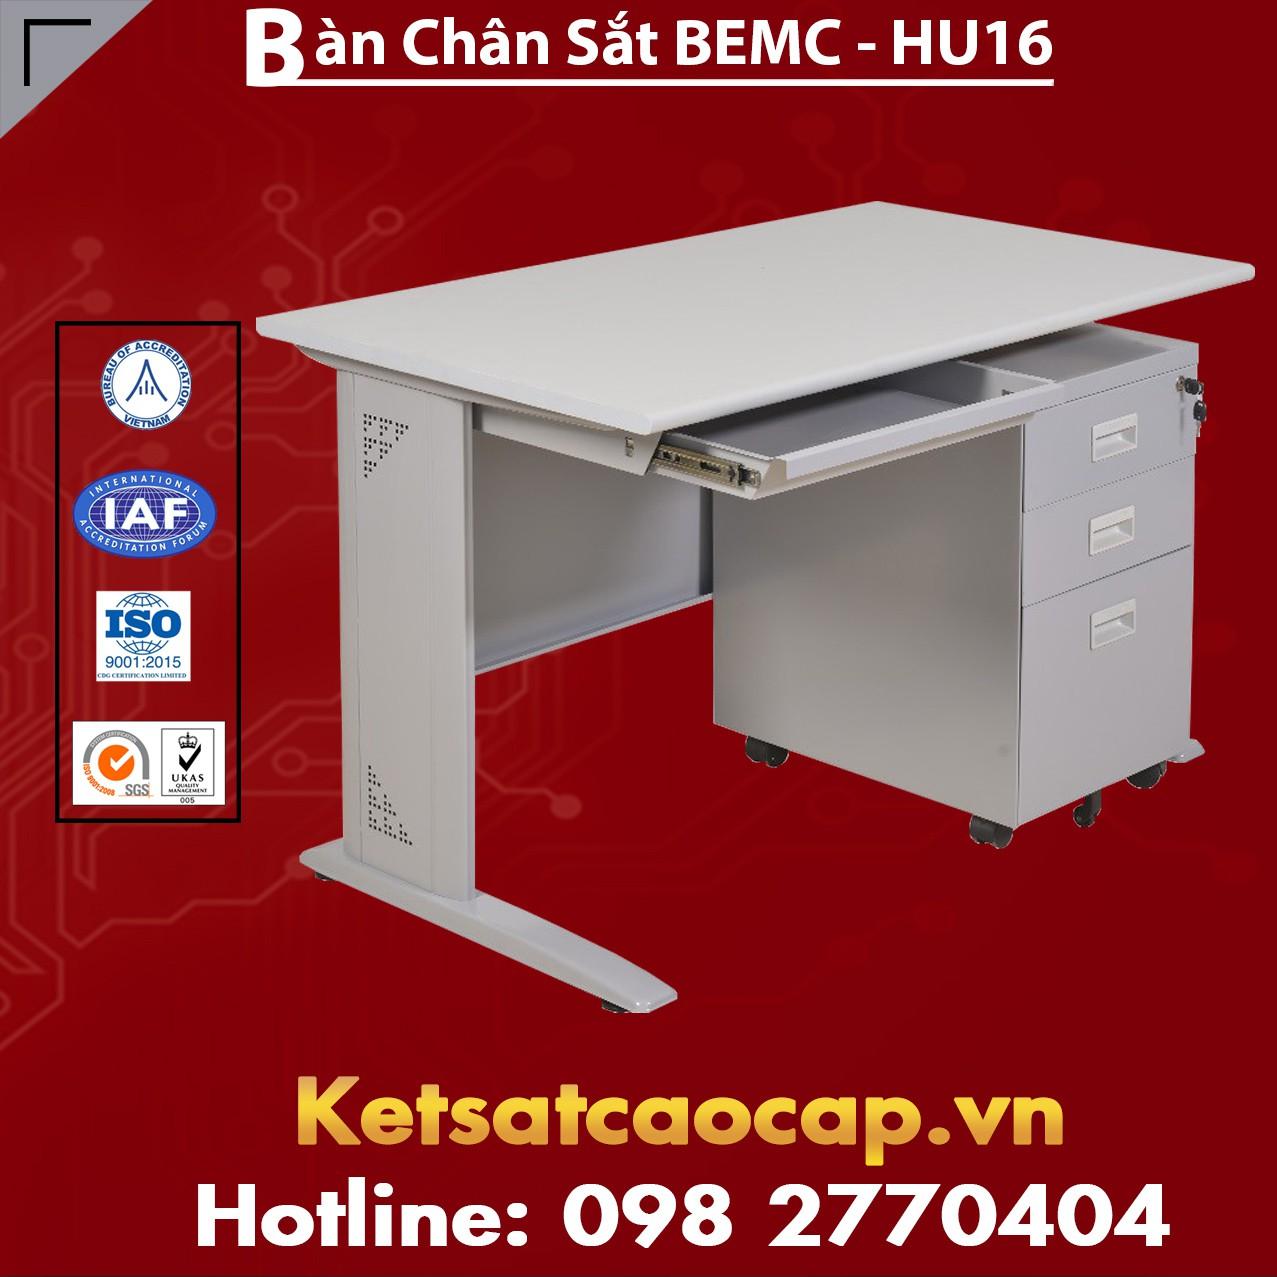 Bàn Chân Sắt BEMC - HU16